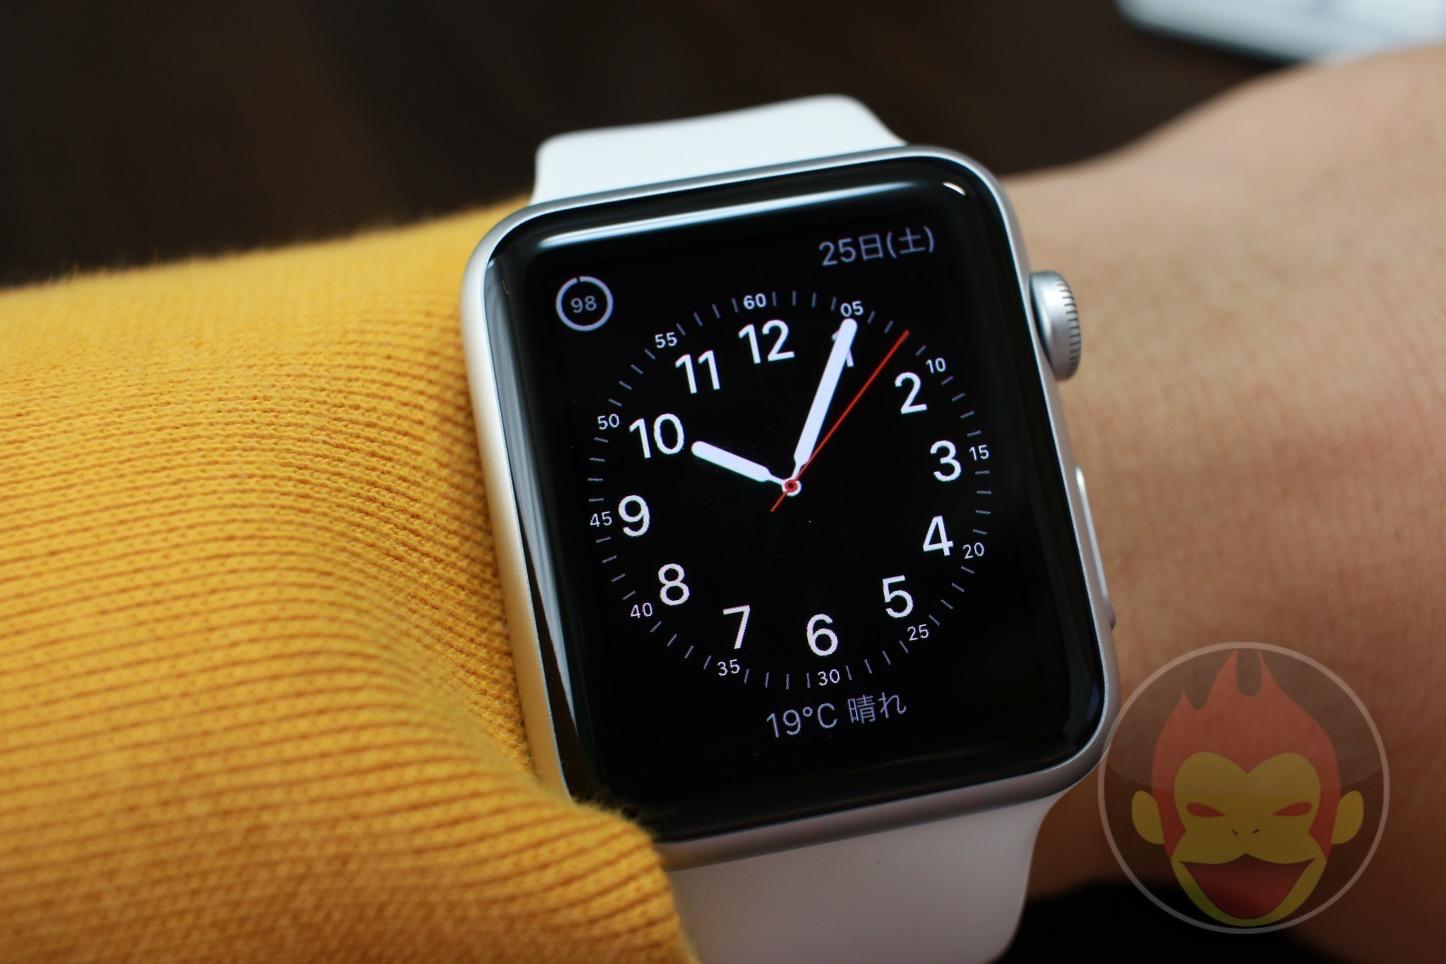 Apple-Watch-Battery-Usage-03.JPG